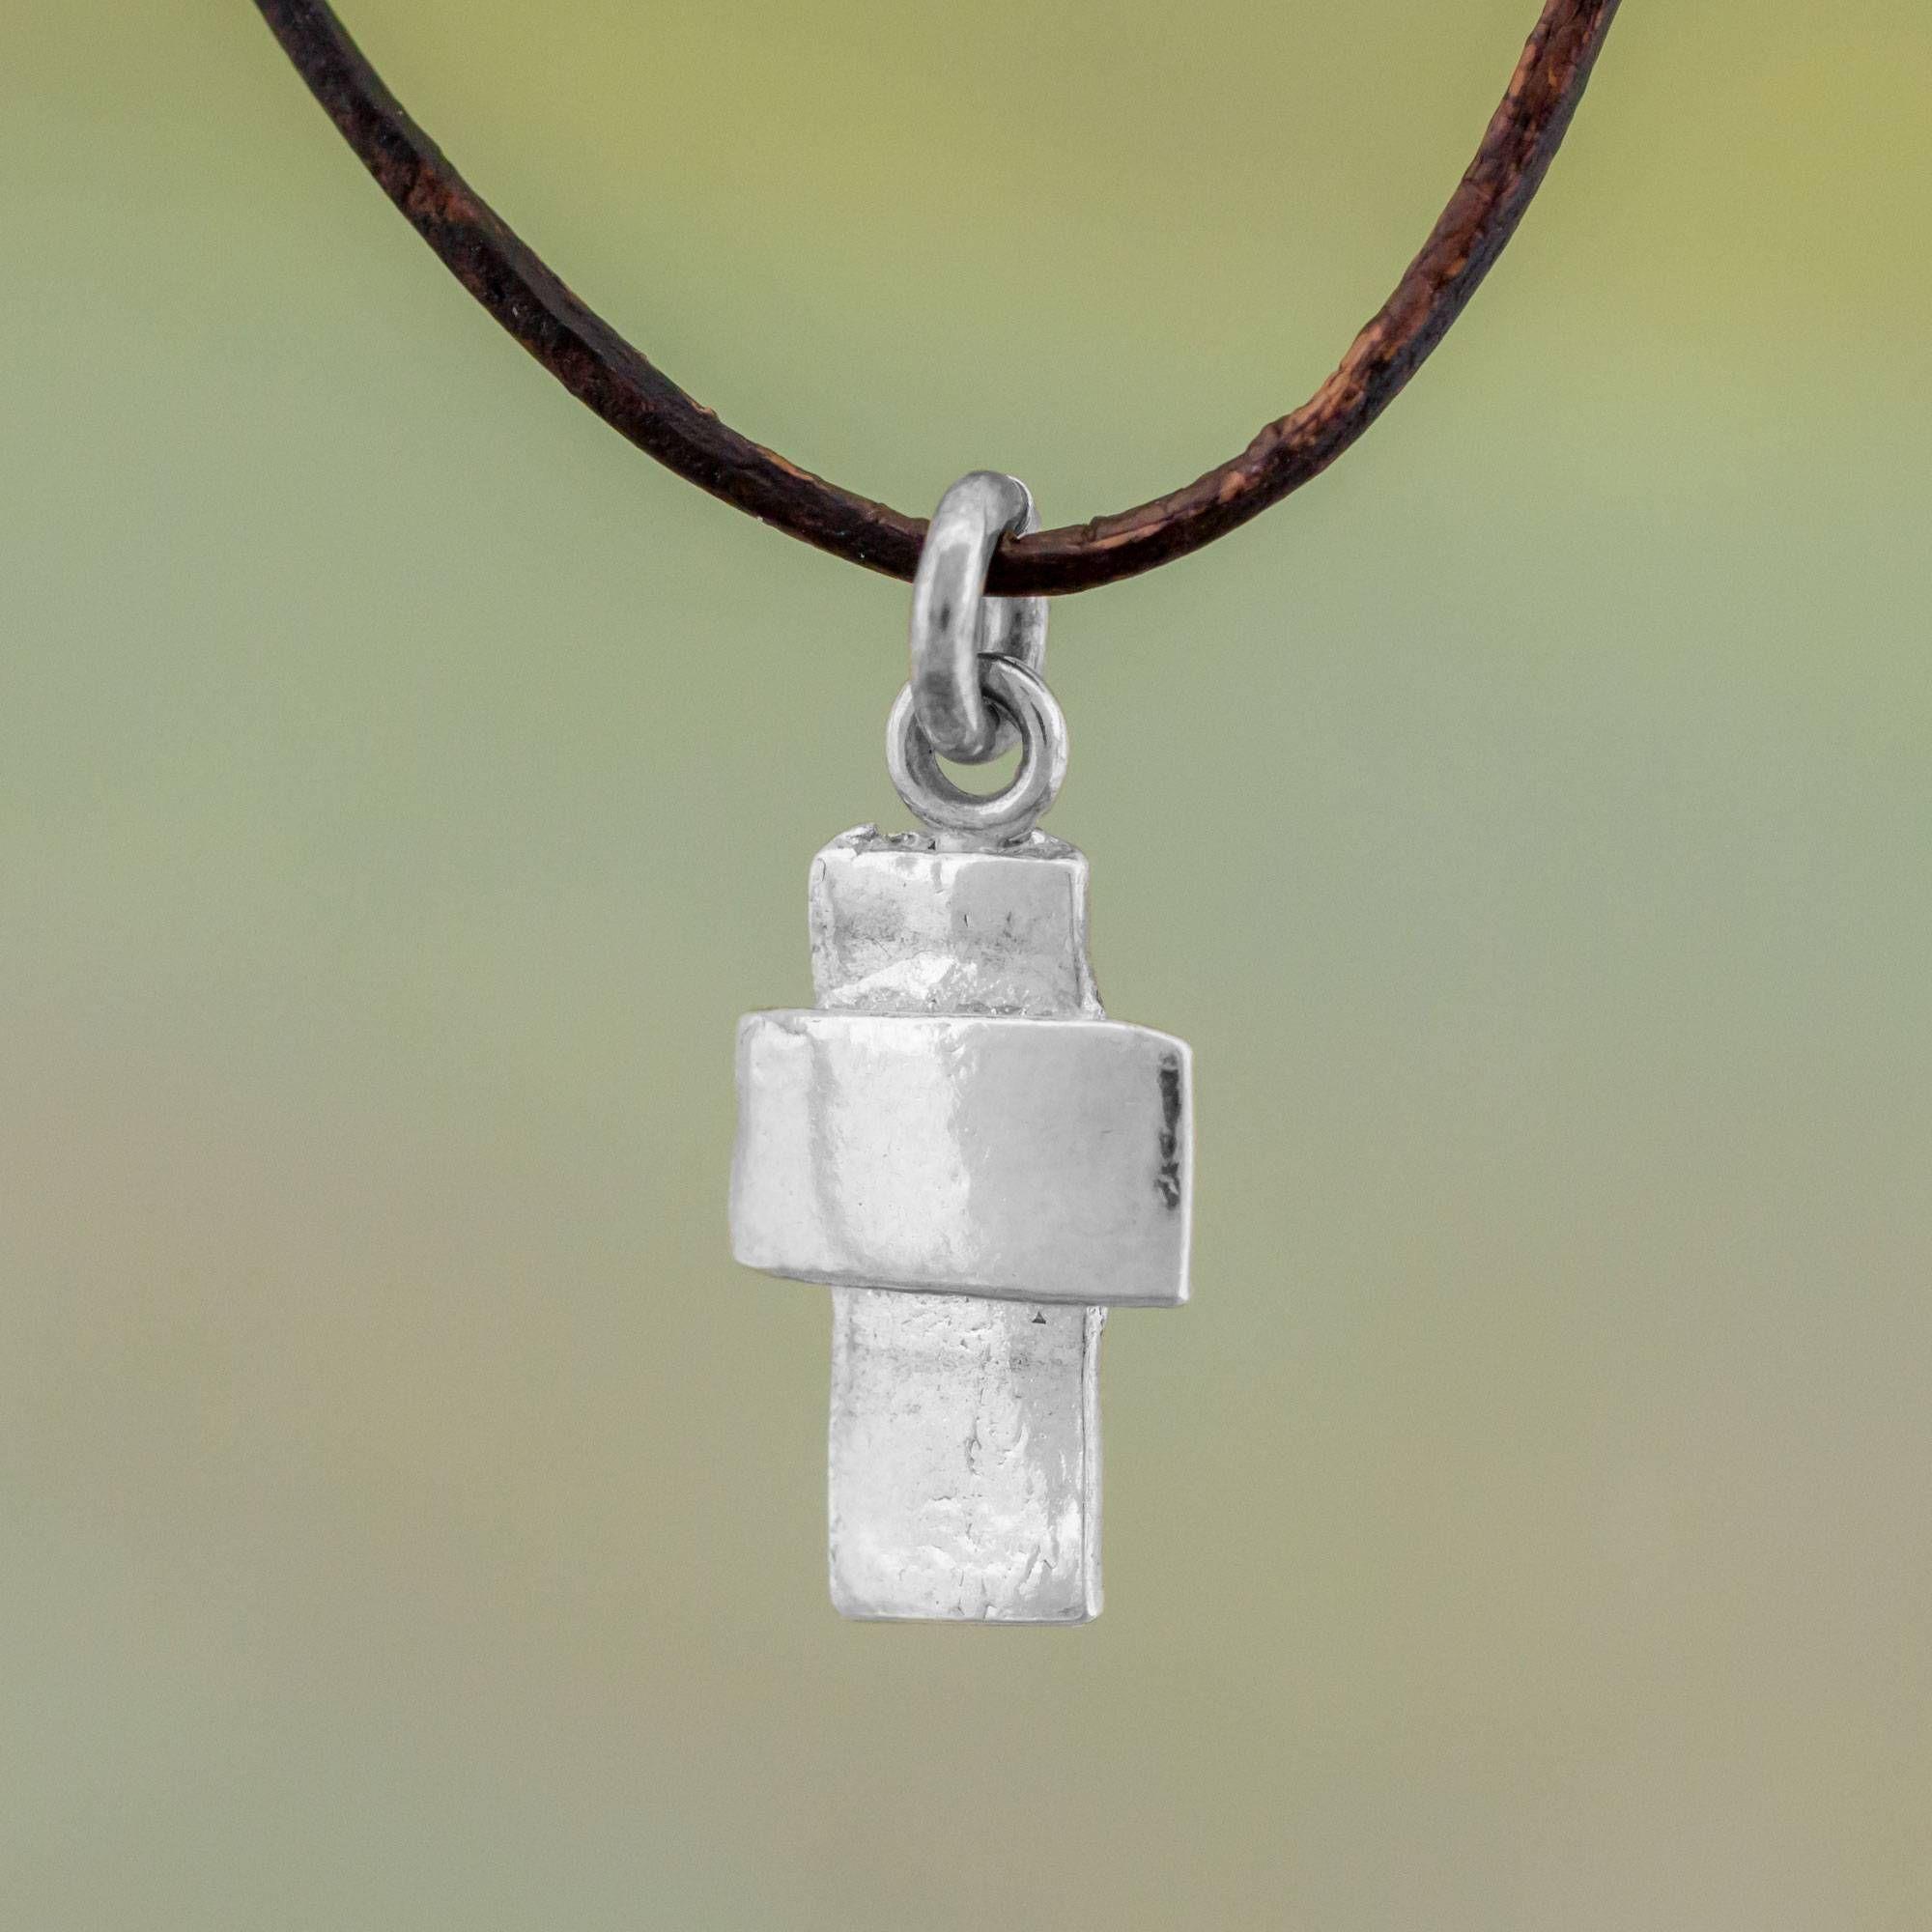 Guatemalan Fine Silver And Leather Cross Pendant Necklace, Faithful Dependance